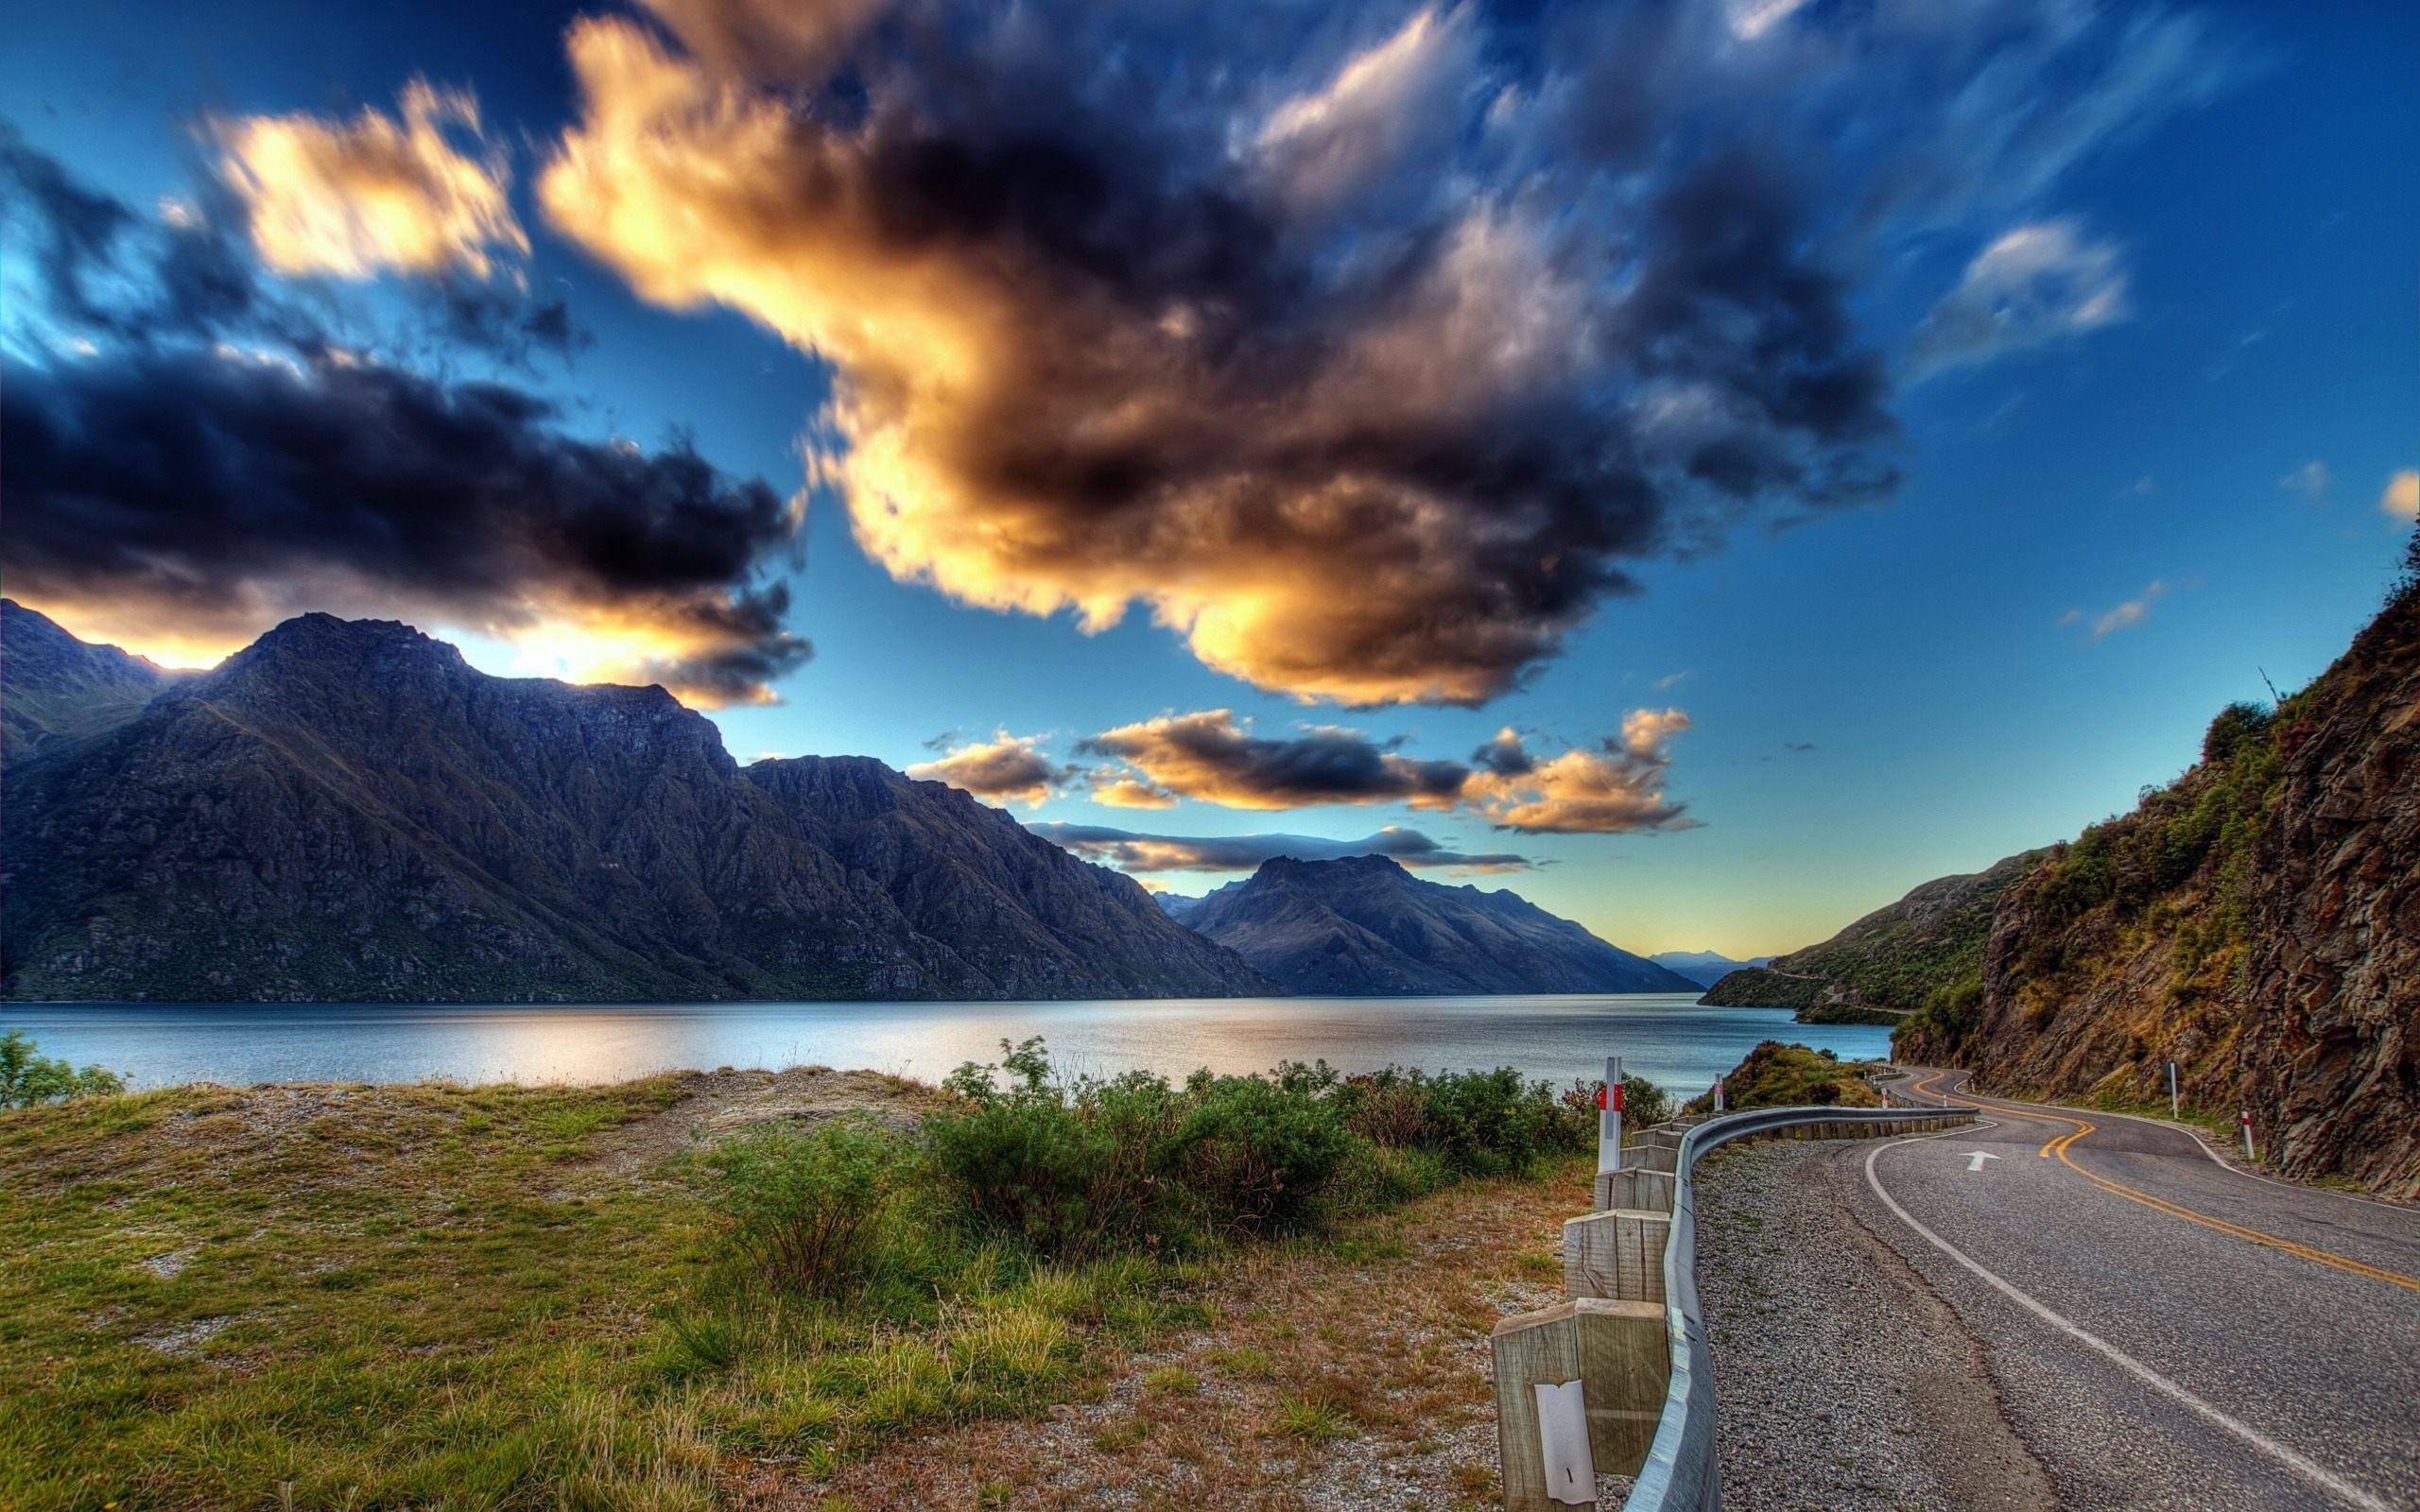 Beautiful Morning Landscape Wallpaper HD Download Desktop